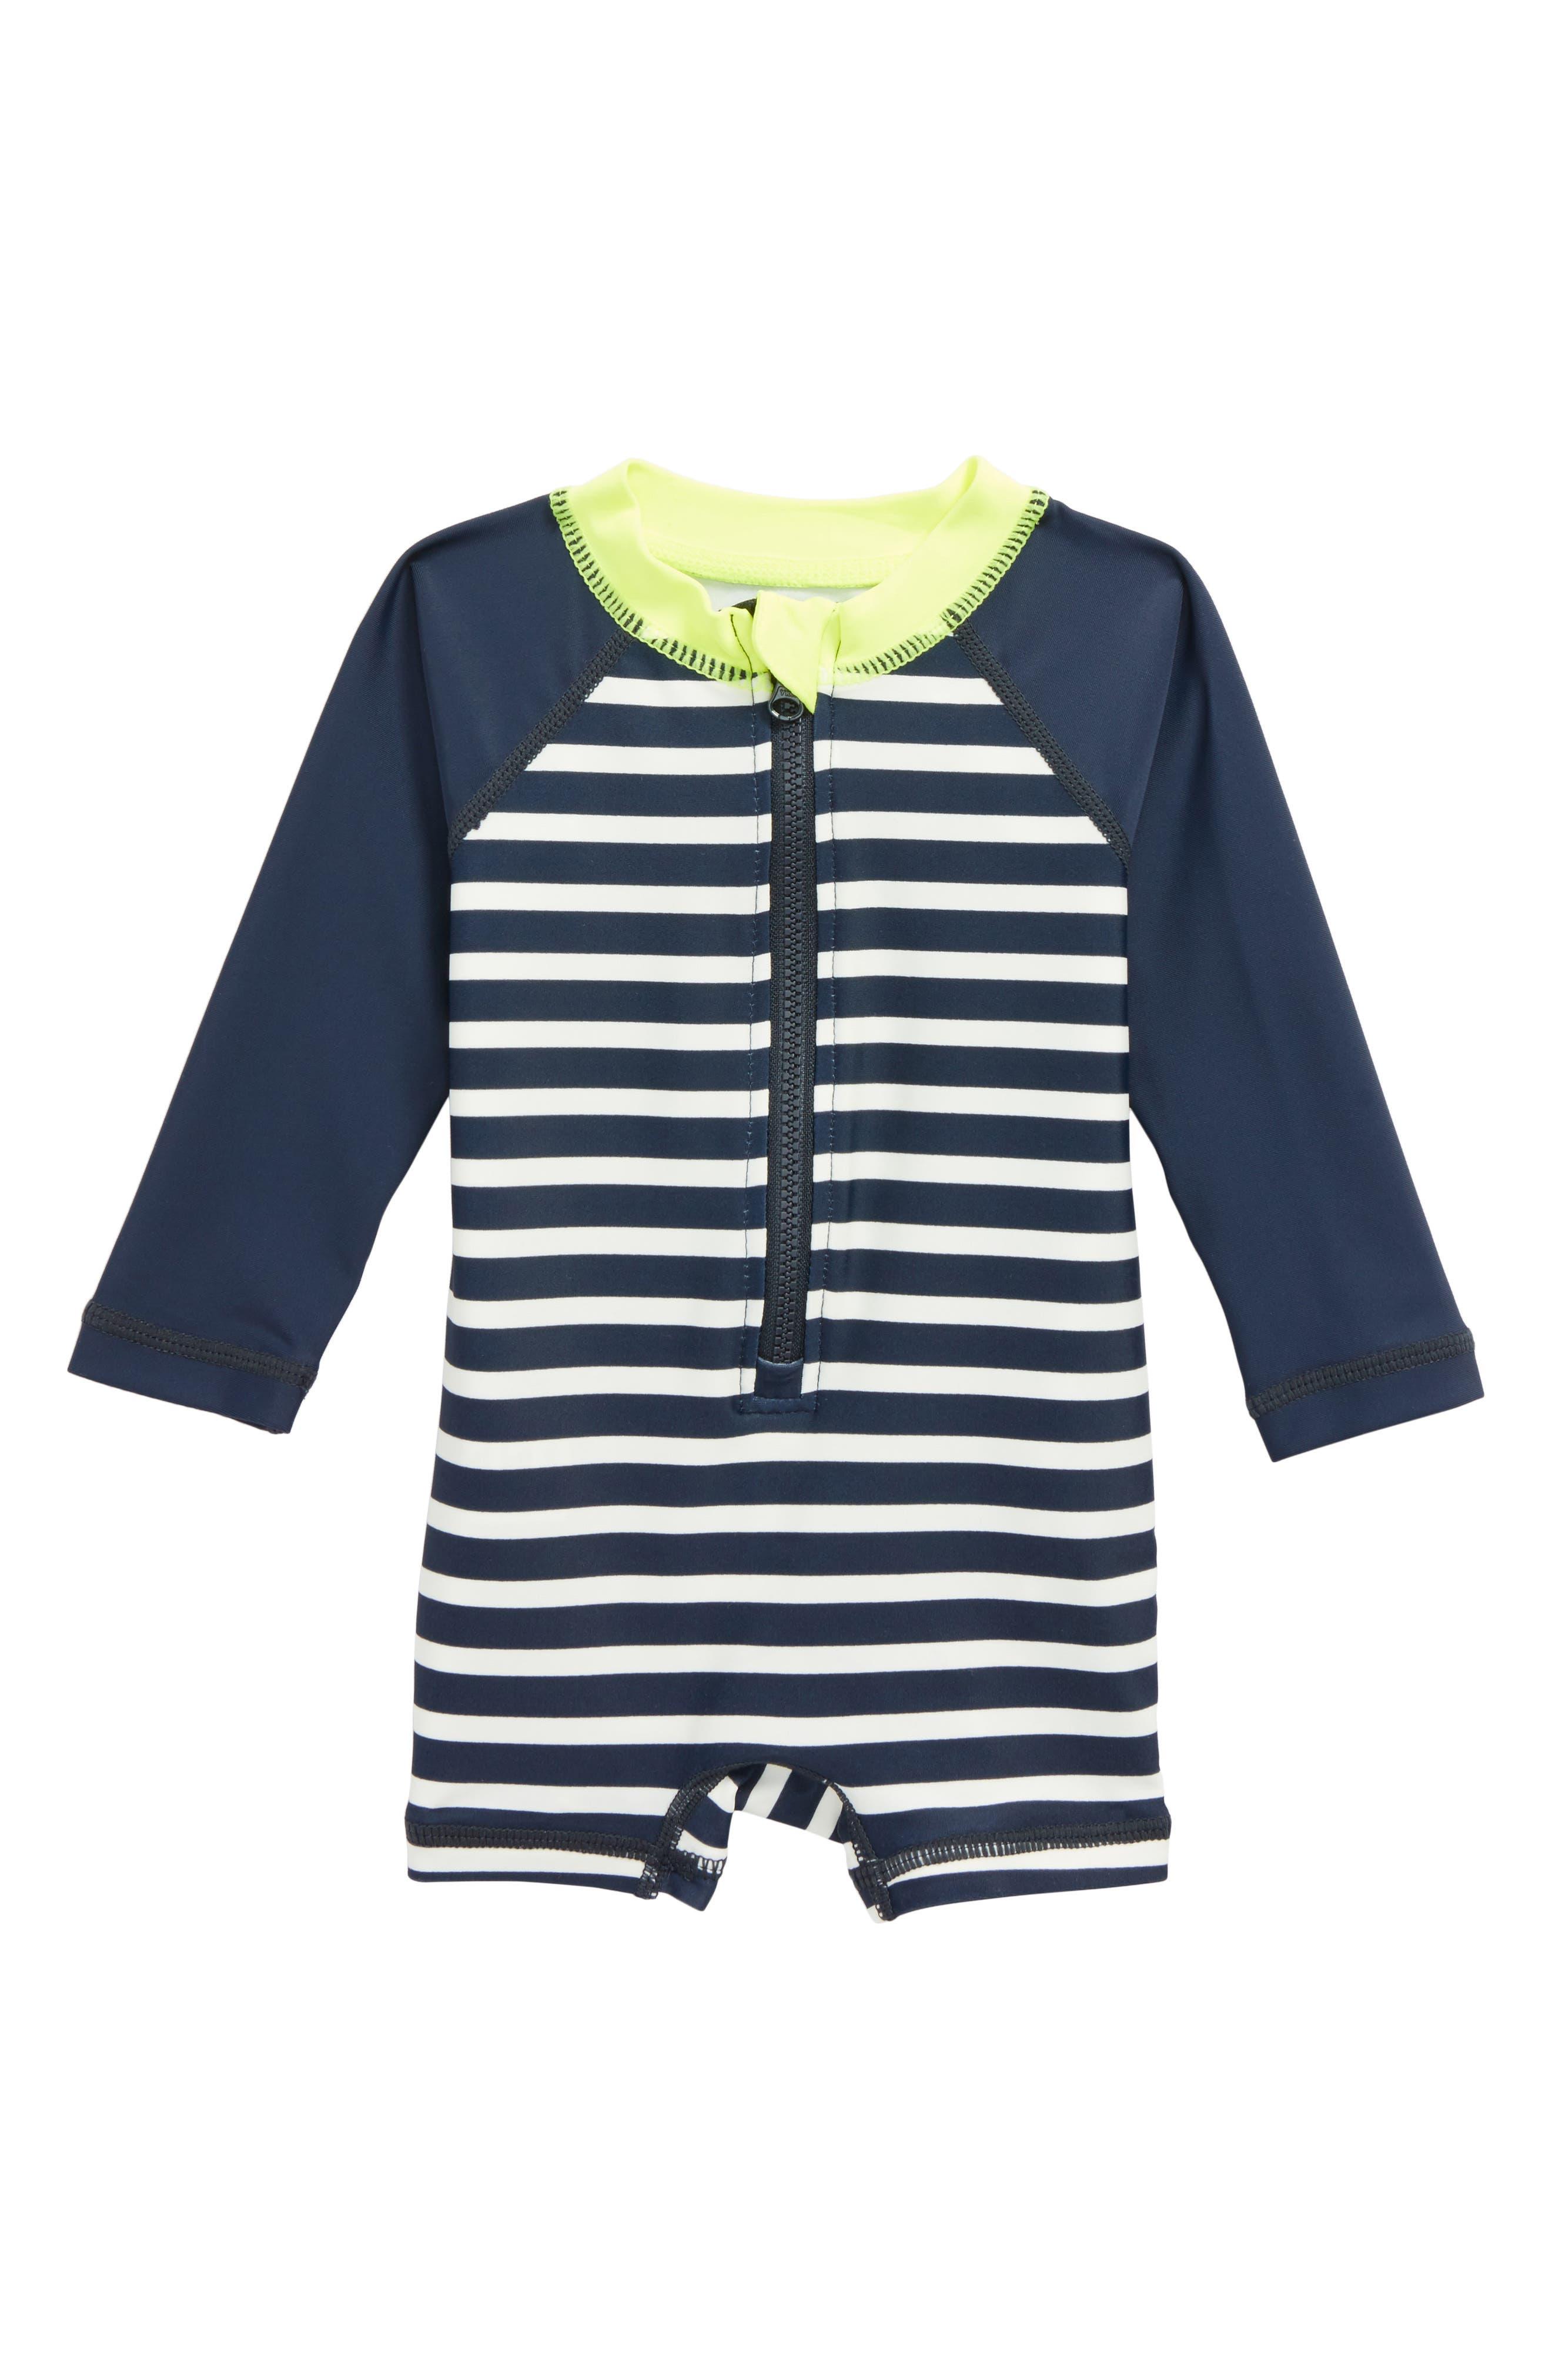 Stripe One-Piece Rashguard Swimsuit,                             Main thumbnail 1, color,                             Indigo 2-Color Stripe